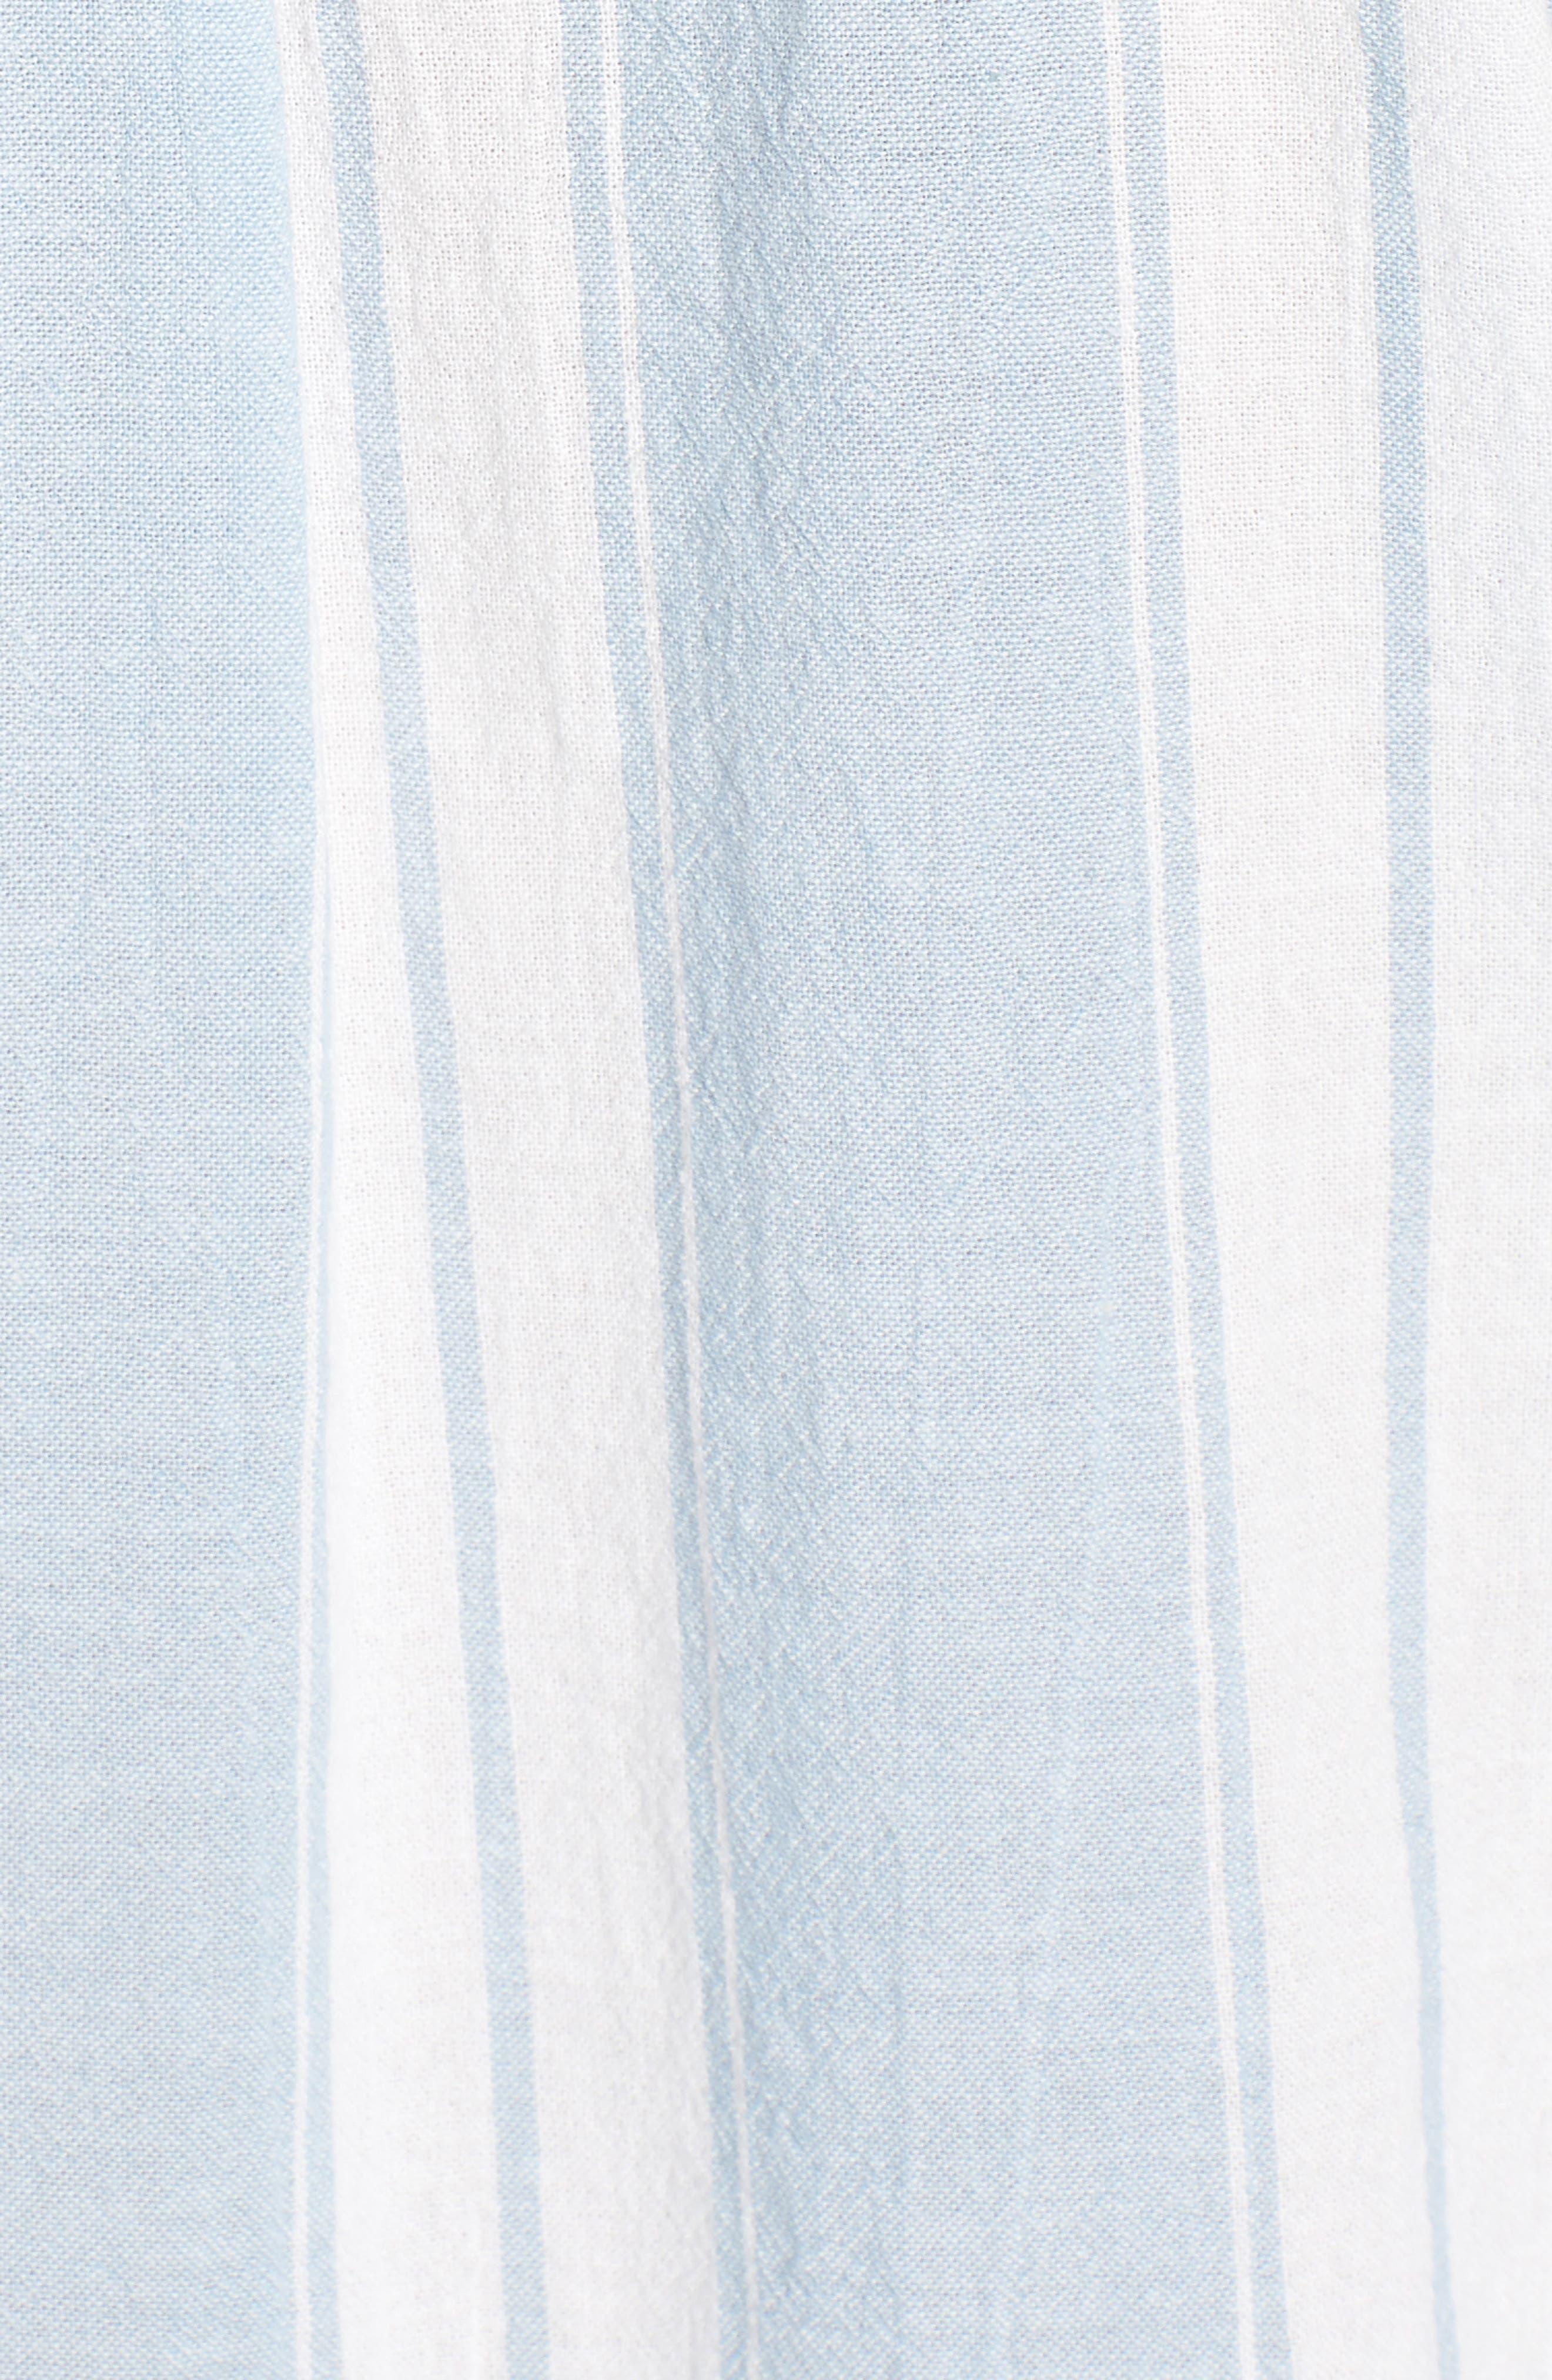 Bleach Stripe Chambray Top,                             Alternate thumbnail 6, color,                             Blue/ White